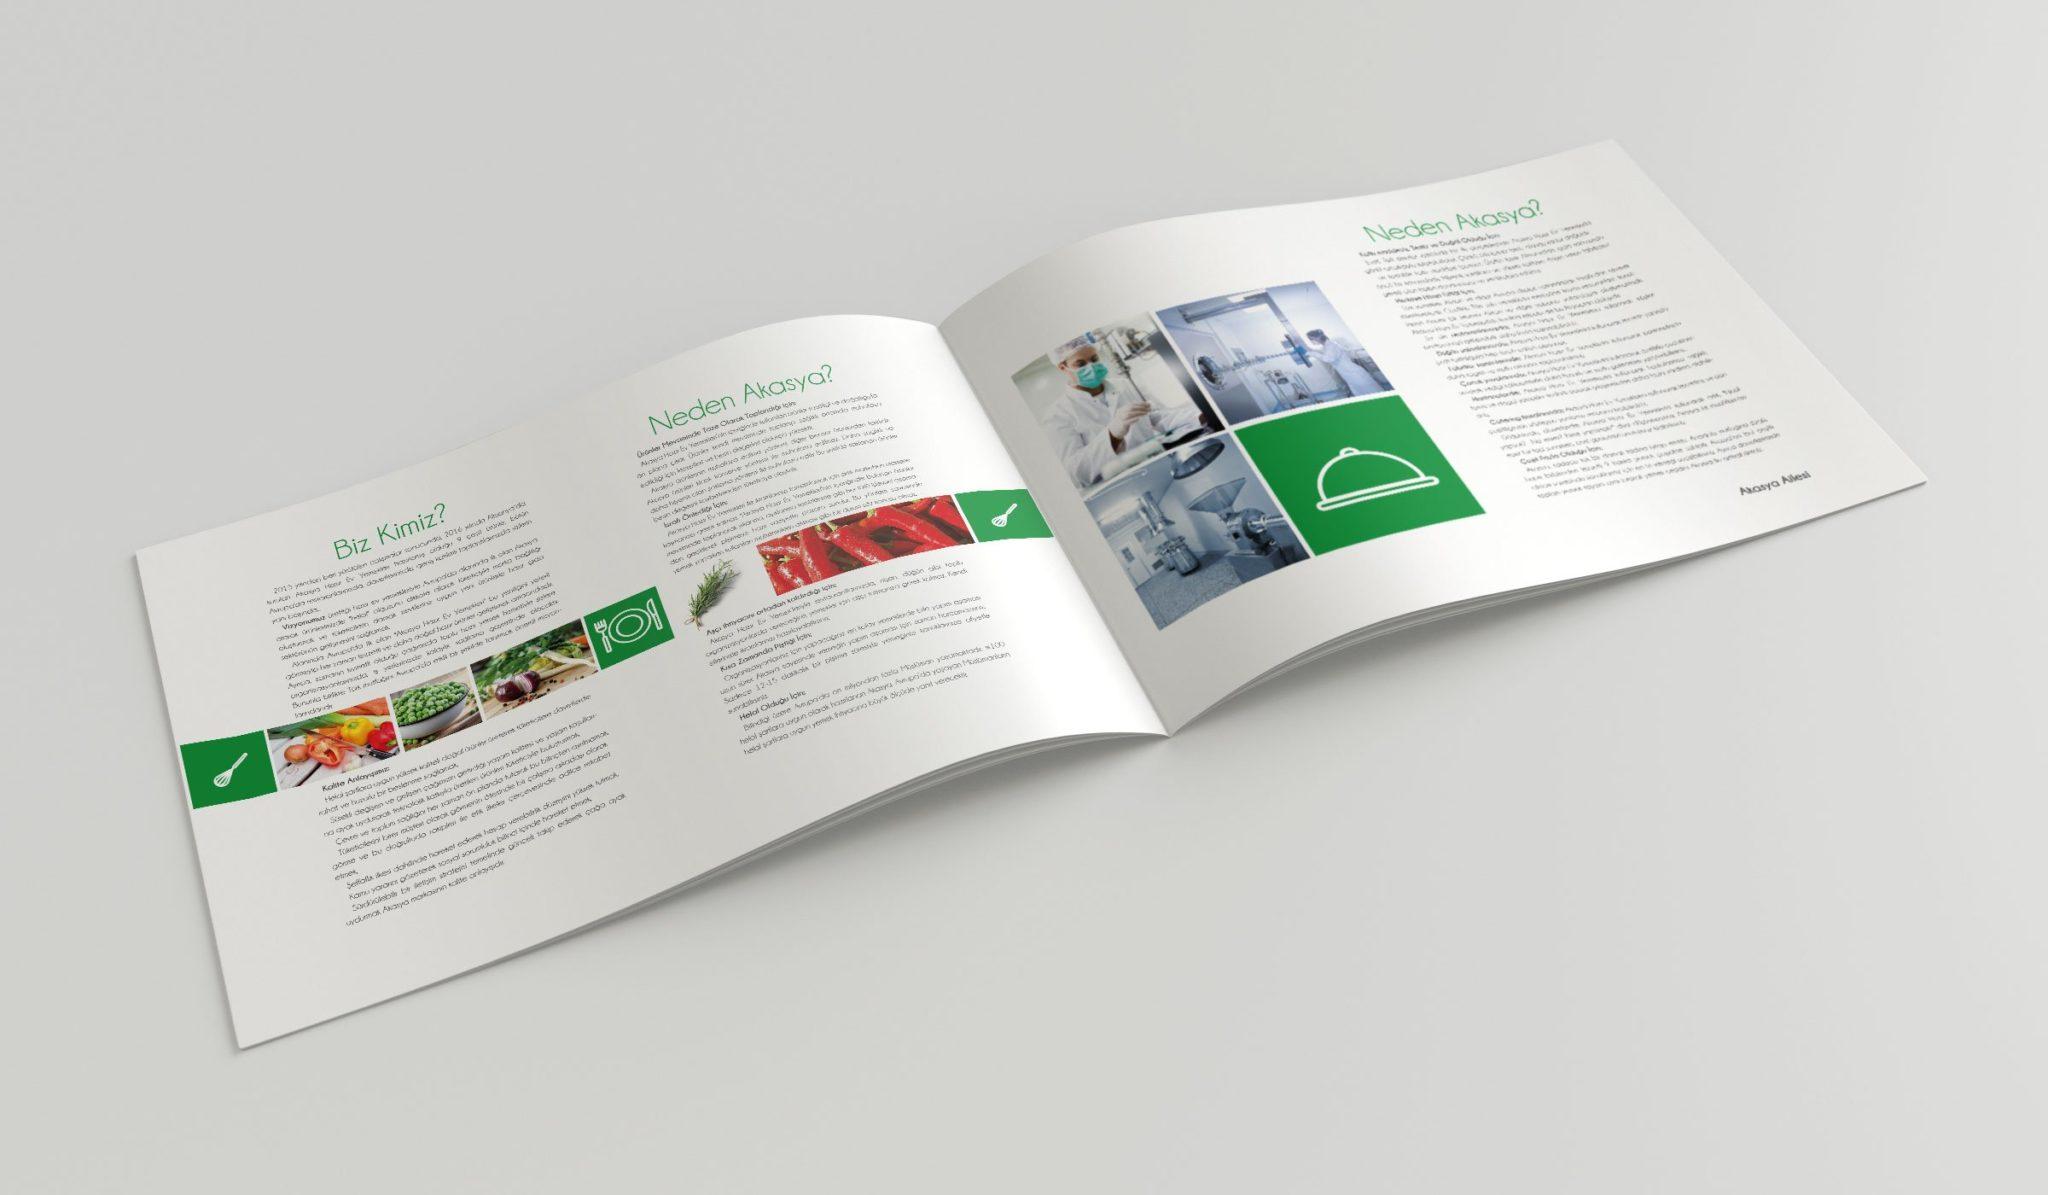 Akasya Katalog Design Tutus Media